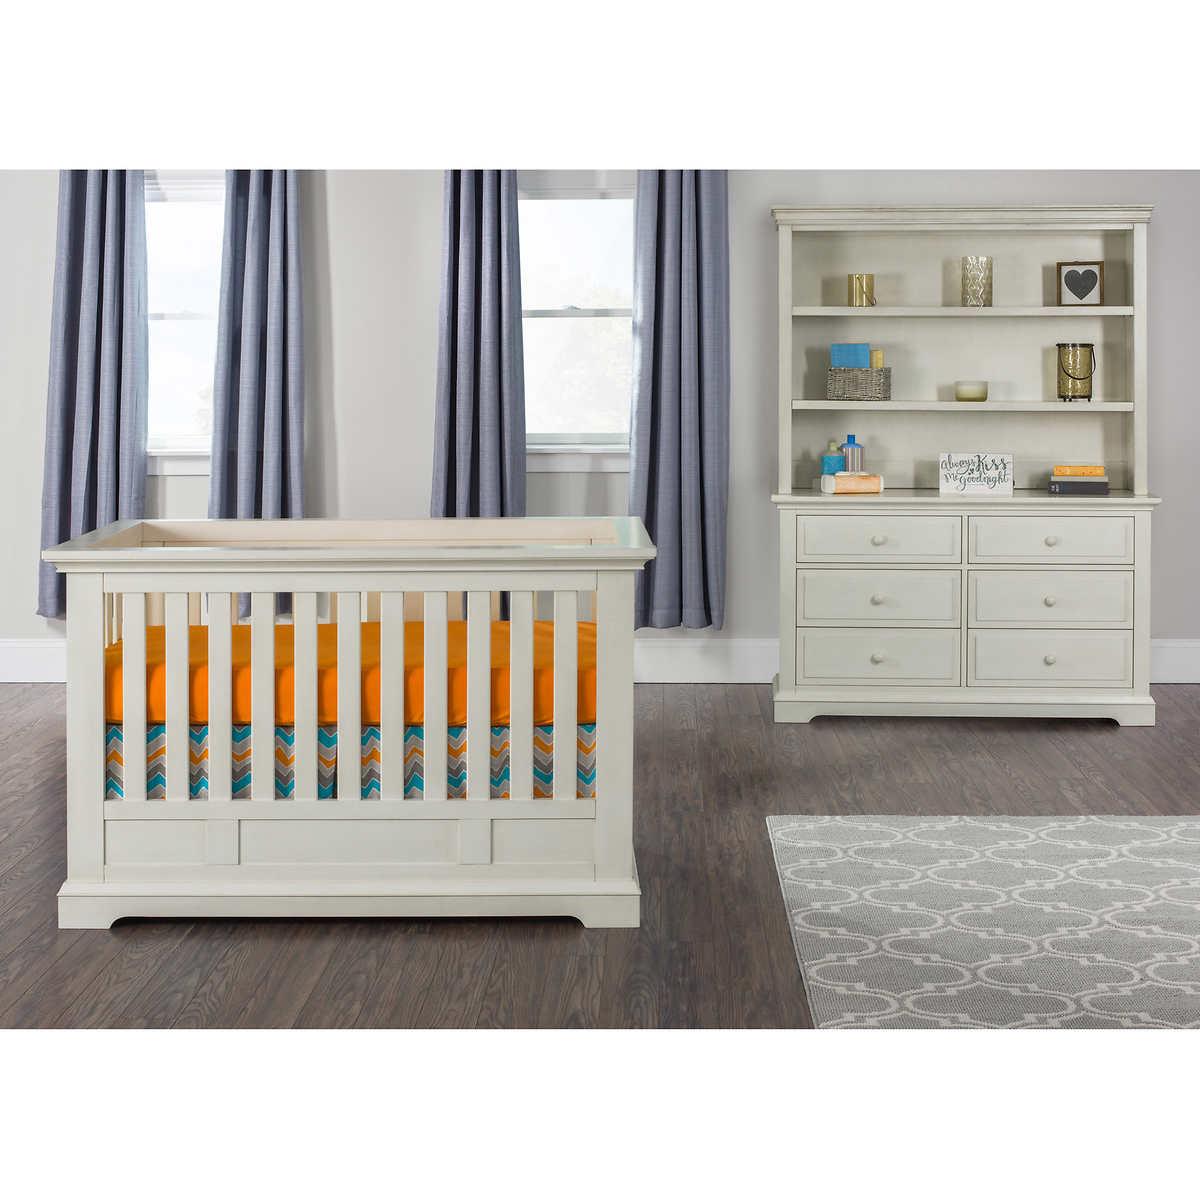 nursery furniture collections  costco - addison euro crib piece nursery collection white